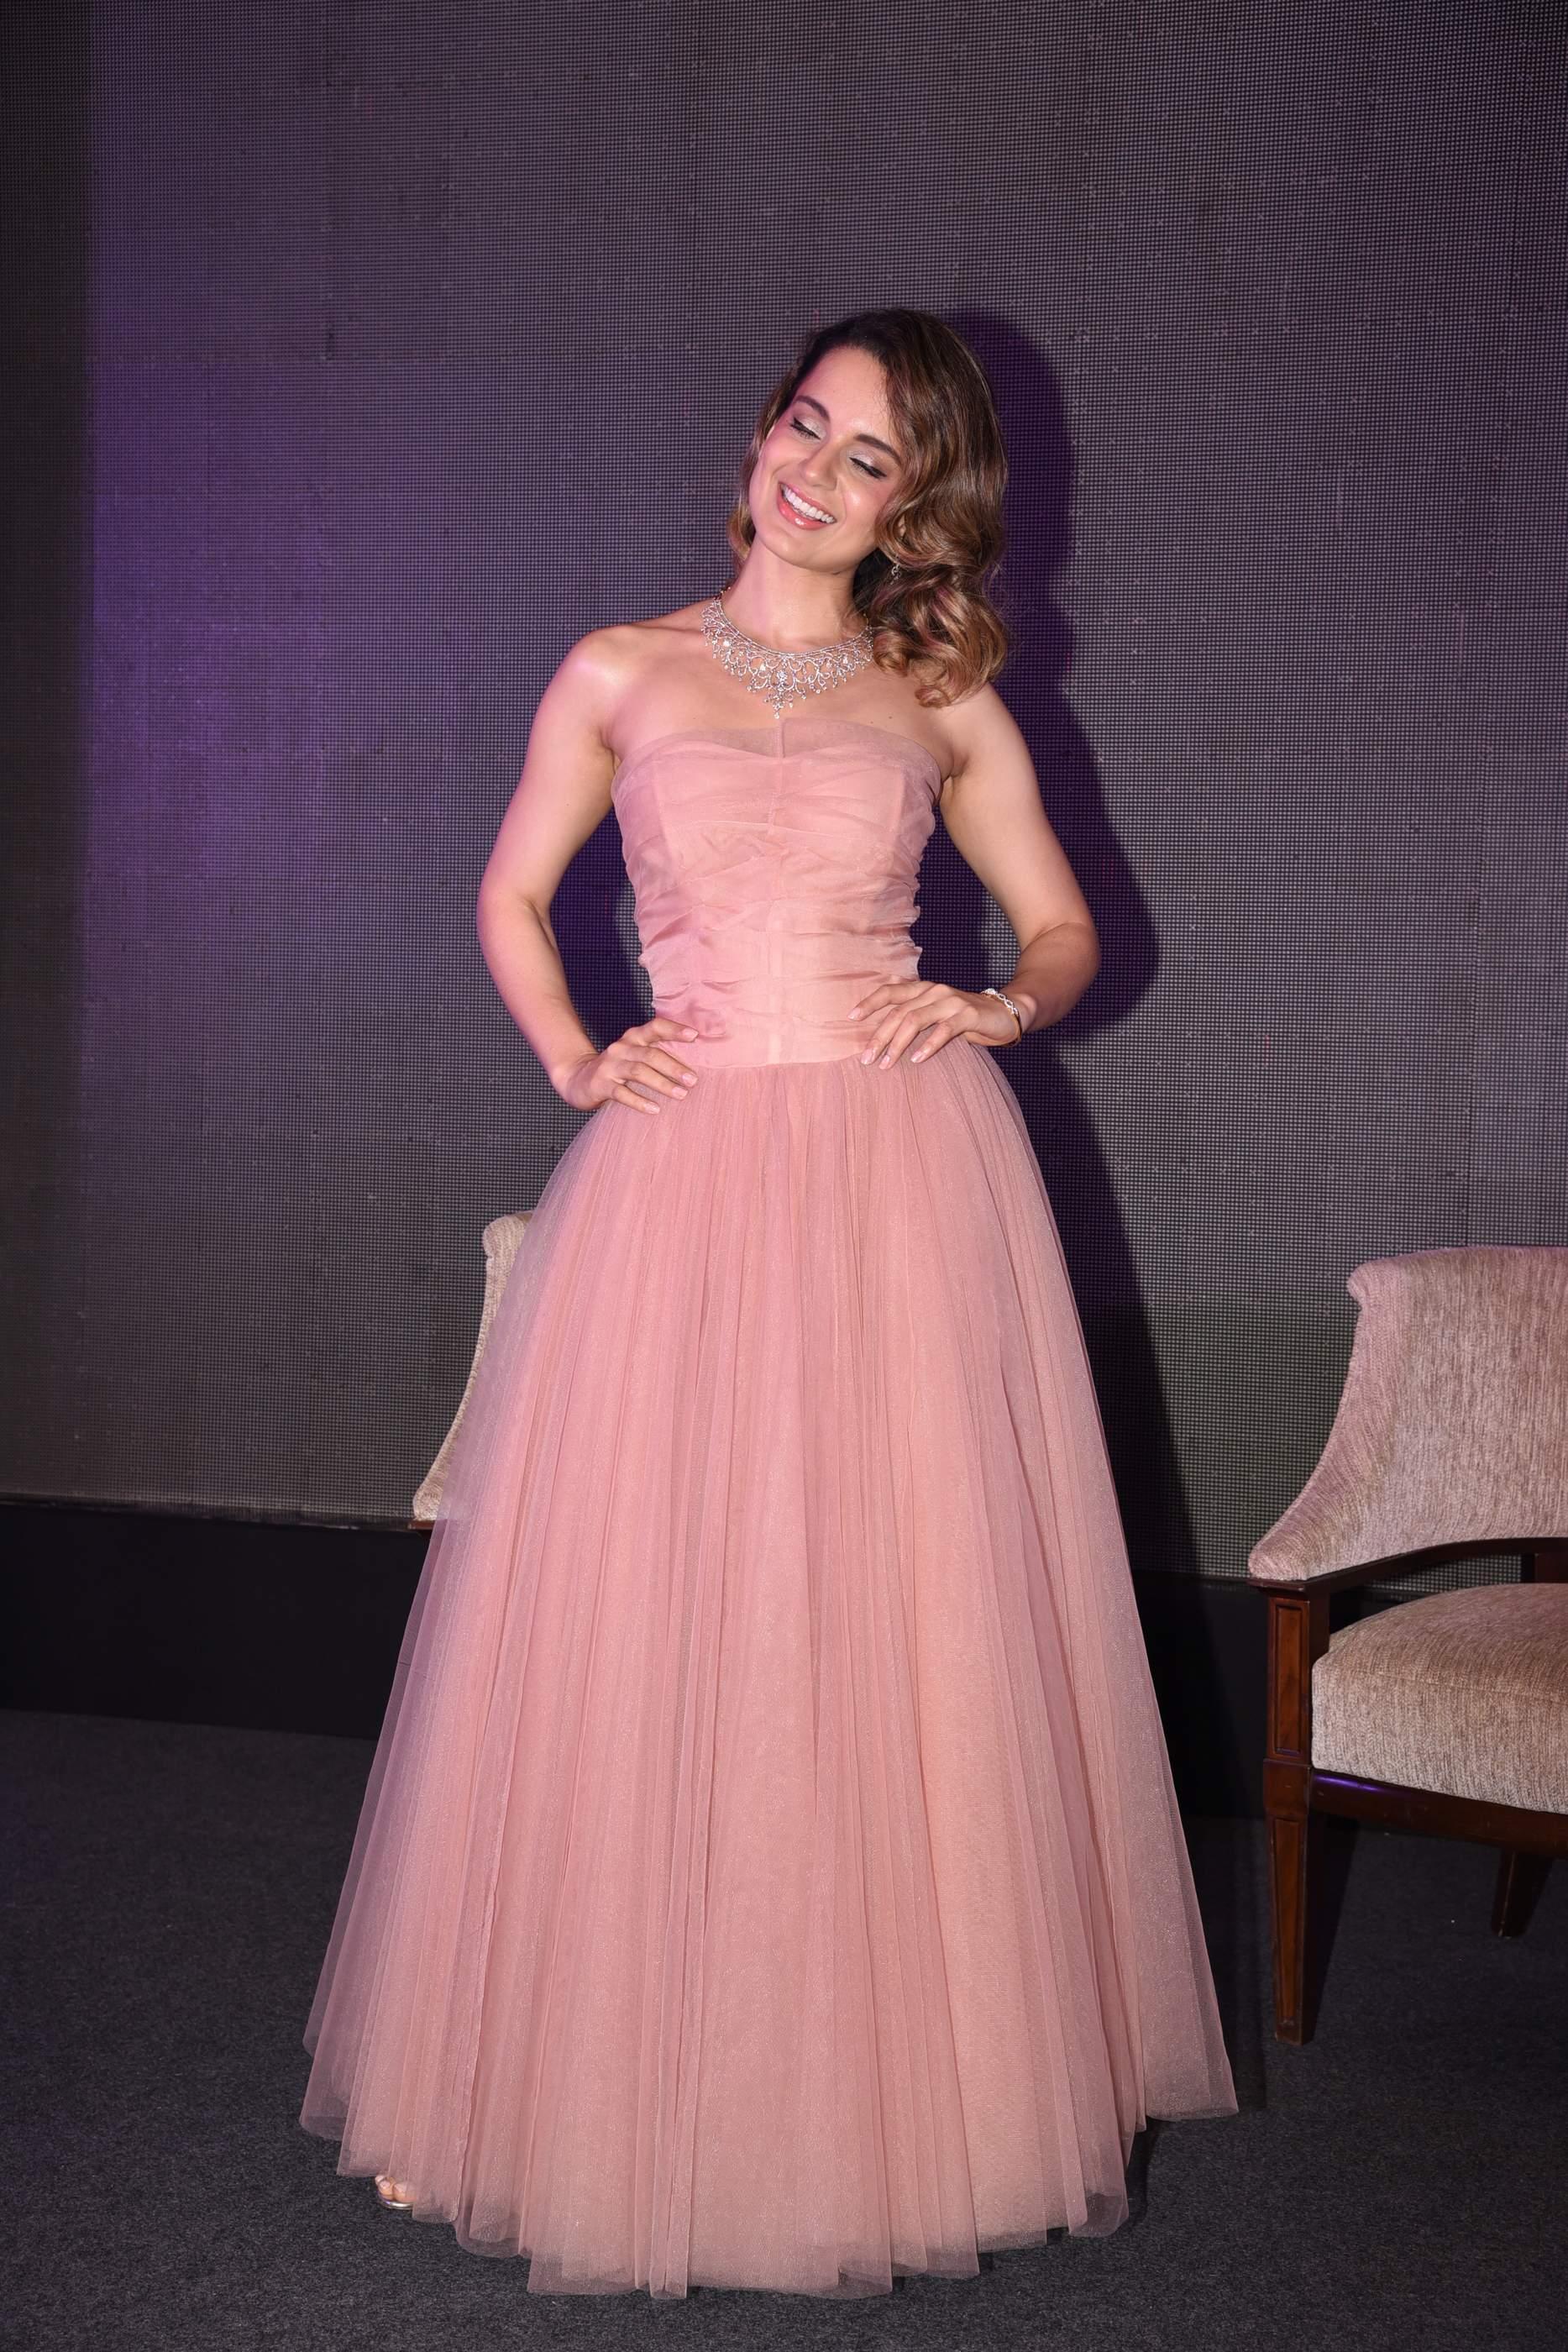 Kangana Ranaut Beautiful Kangana Ranaut Dazzles In Stunning Outfit | Nakshatra Kangana Nakshatra 26